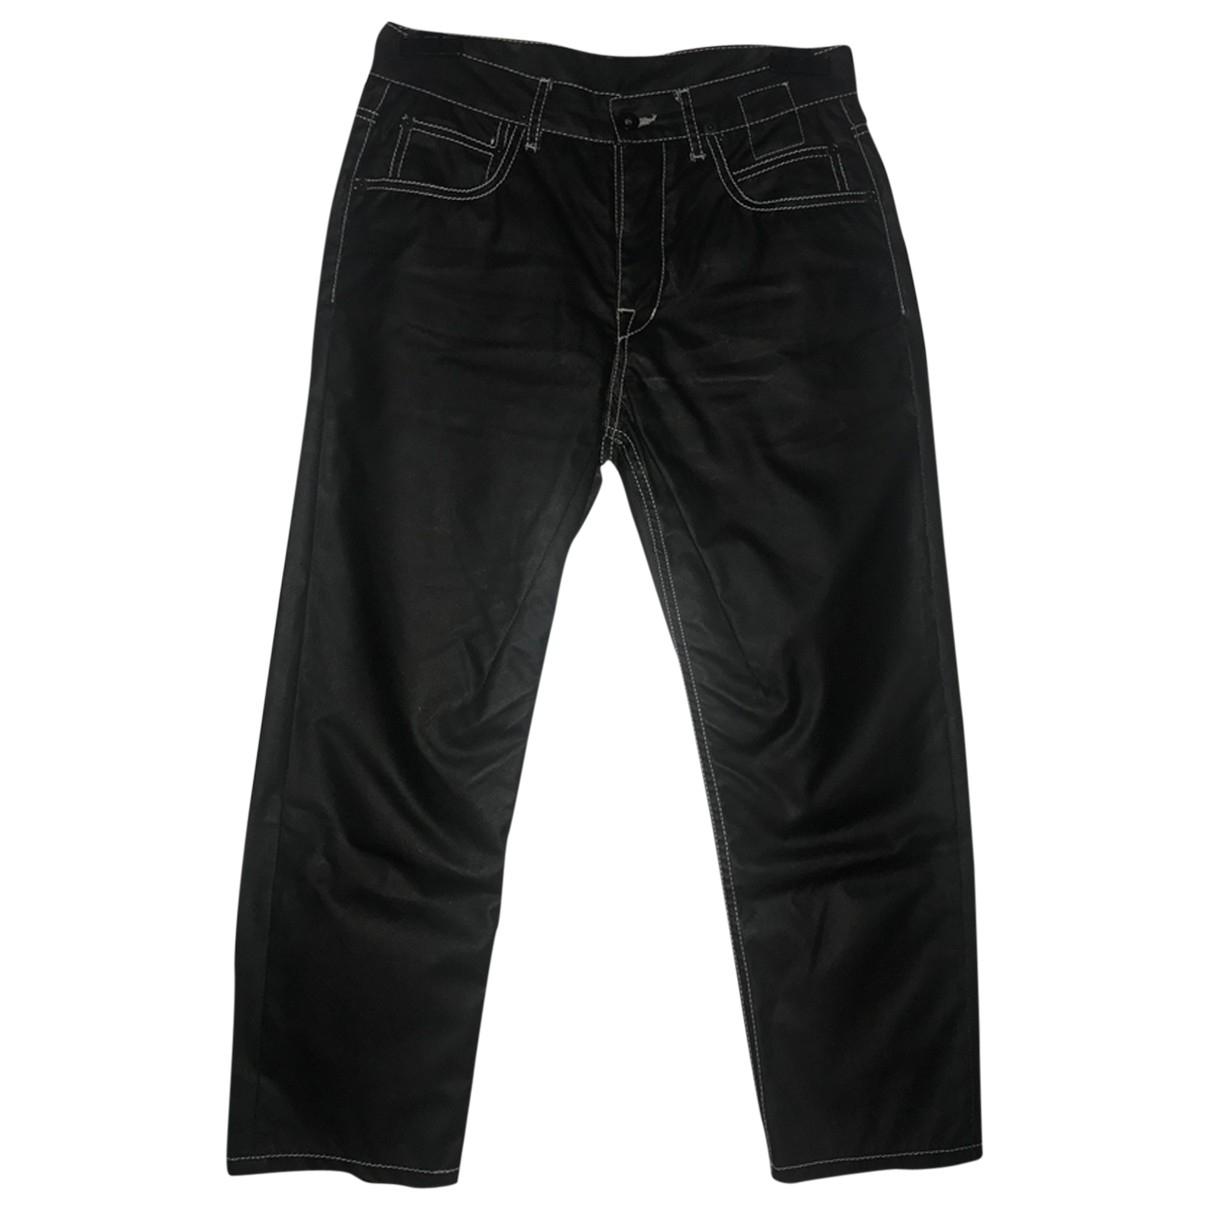 Rick Owens Drkshdw \N Black Trousers for Women One Size IT